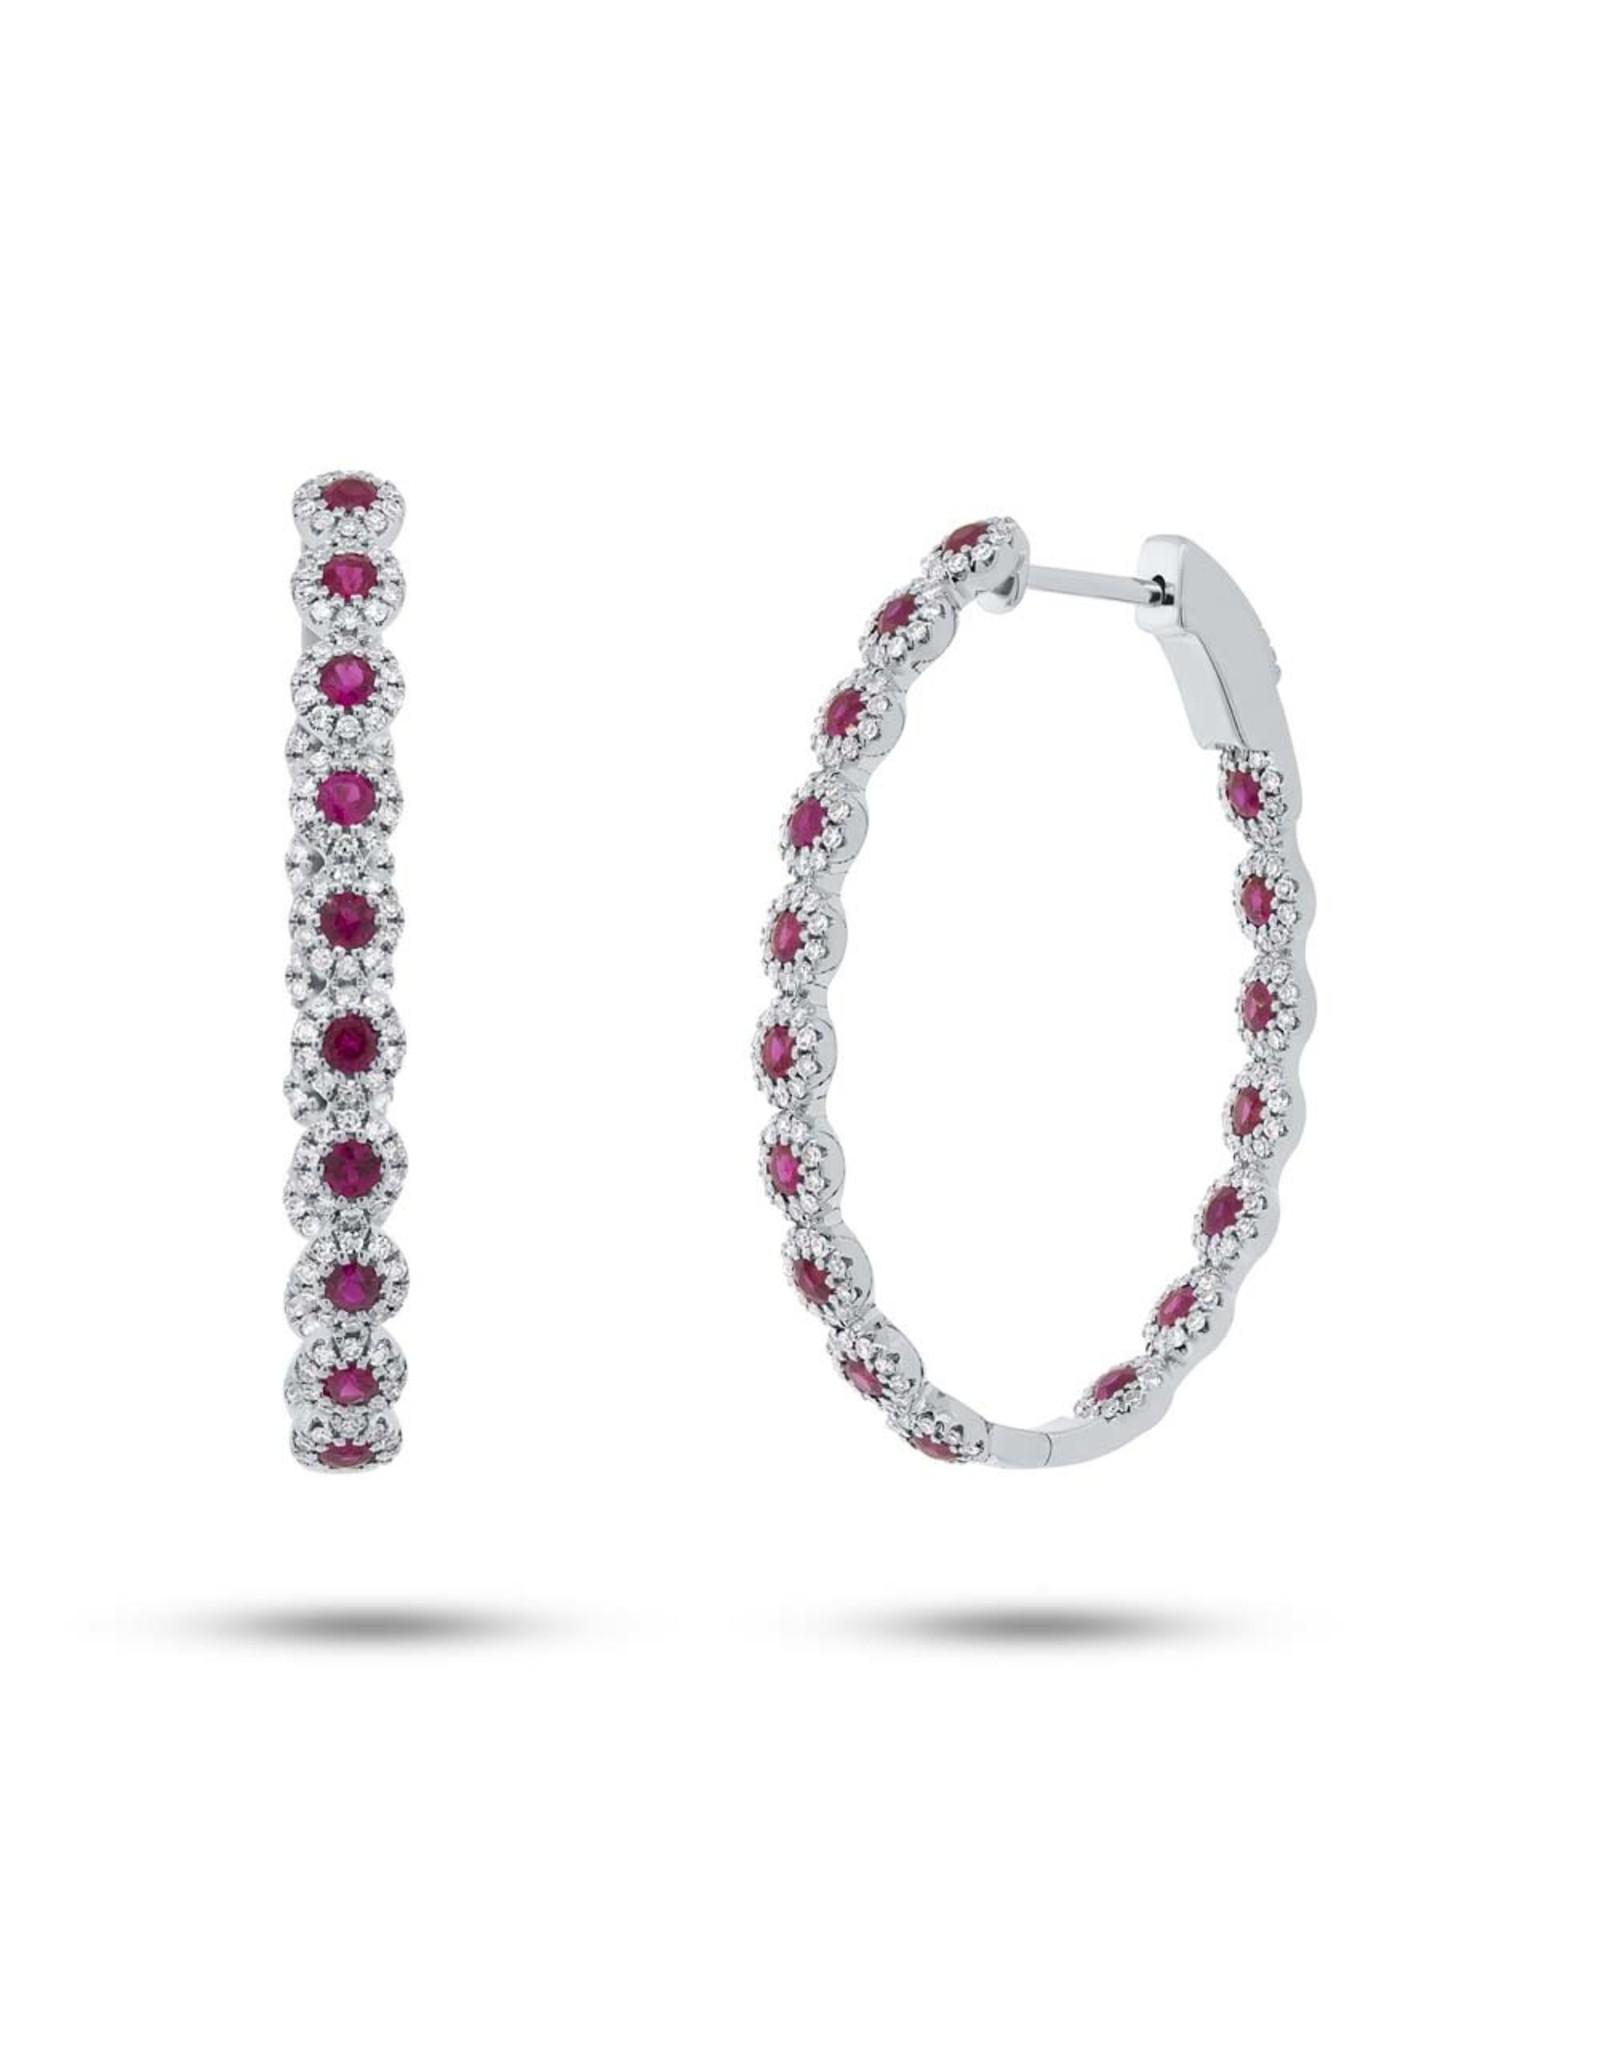 14K White Gold Ruby and Diamond Hoop Earrings, R: 1.54ct, D: 0.86ct